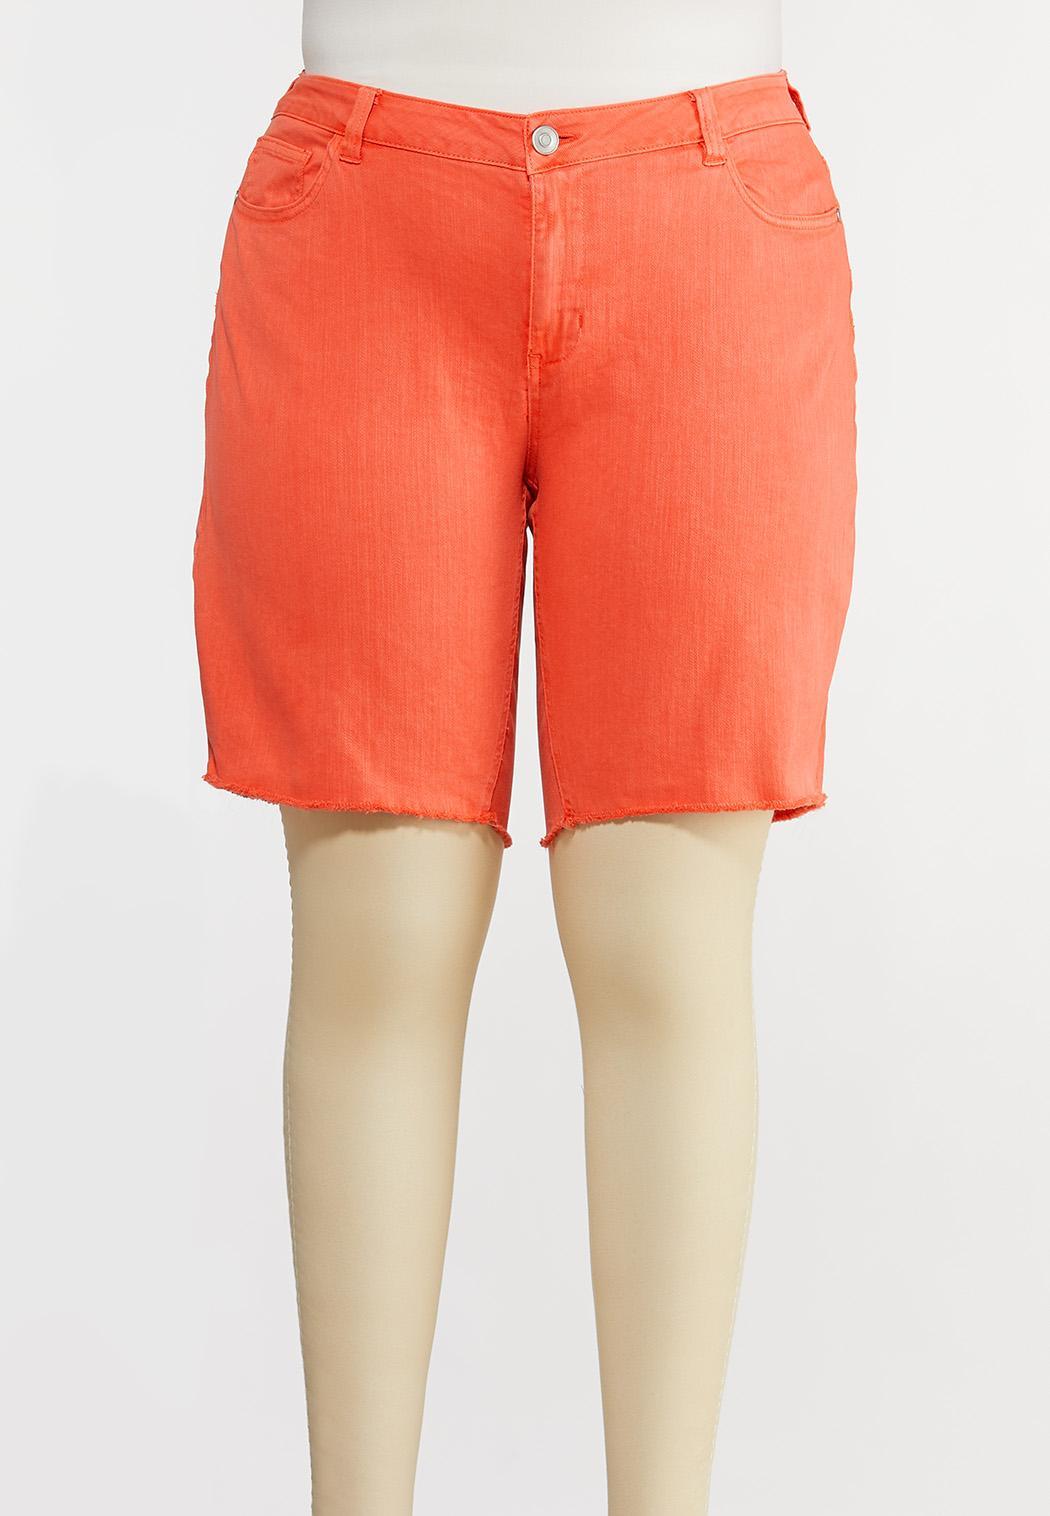 Plus Size Coral Bermuda Denim Shorts